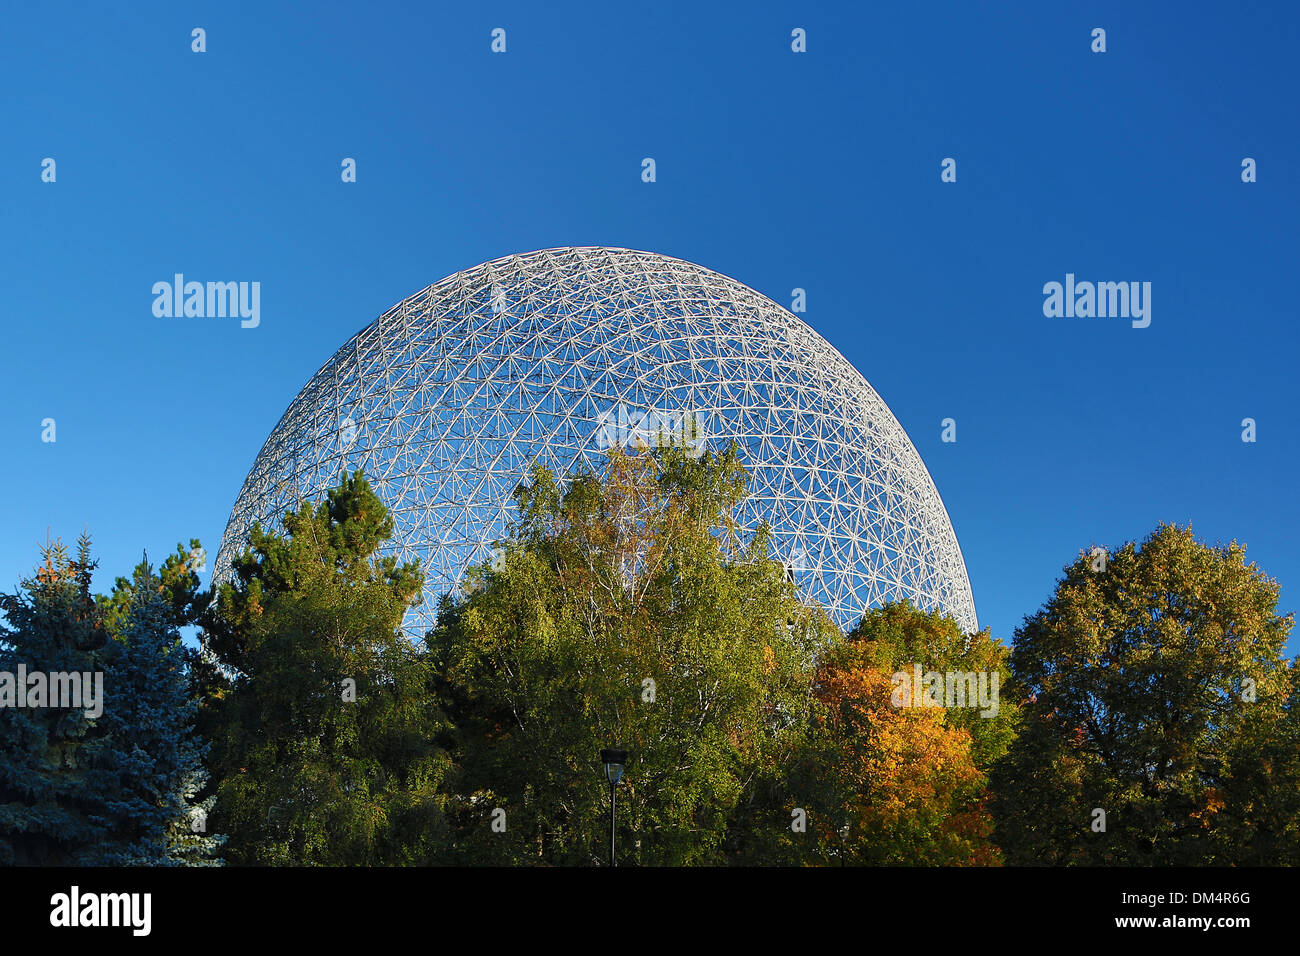 Biosphere, Canada, North America, Environmental, Montreal City, Quebec, architecture, city, museum, travel, Biosphere, round - Stock Image